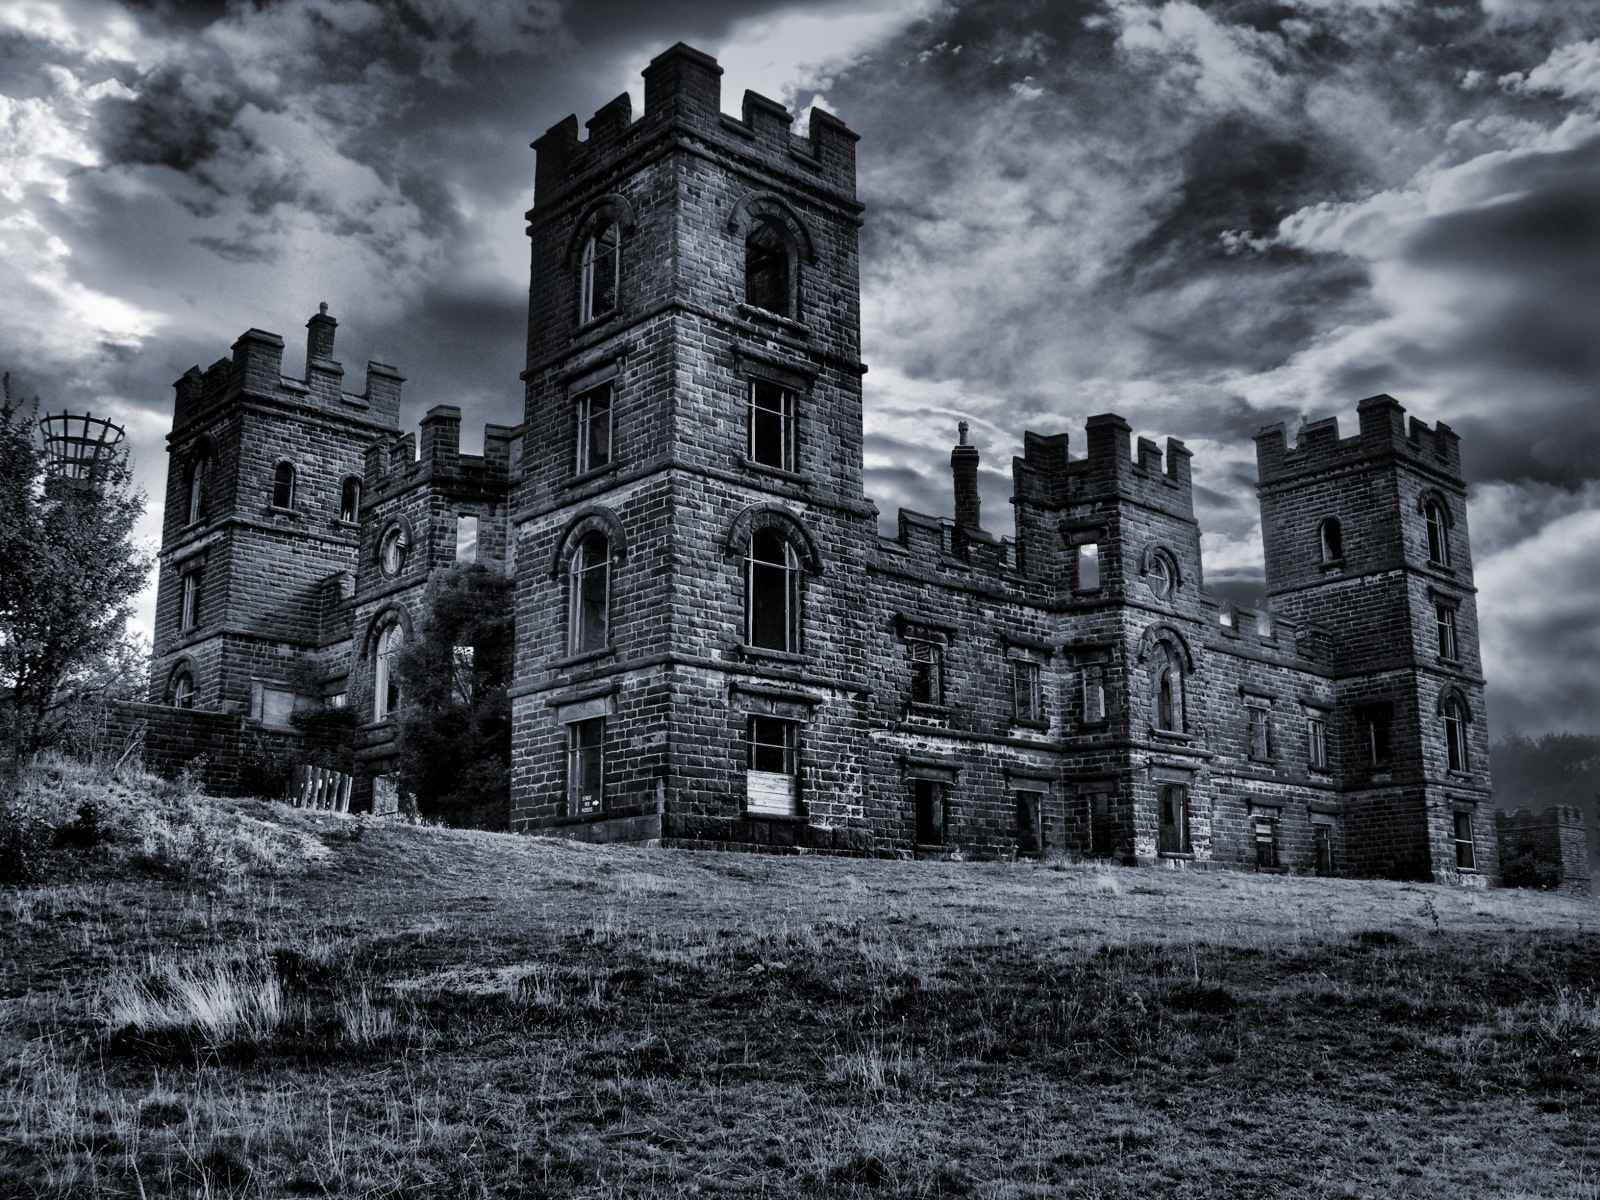 Castle Wallpaper 047